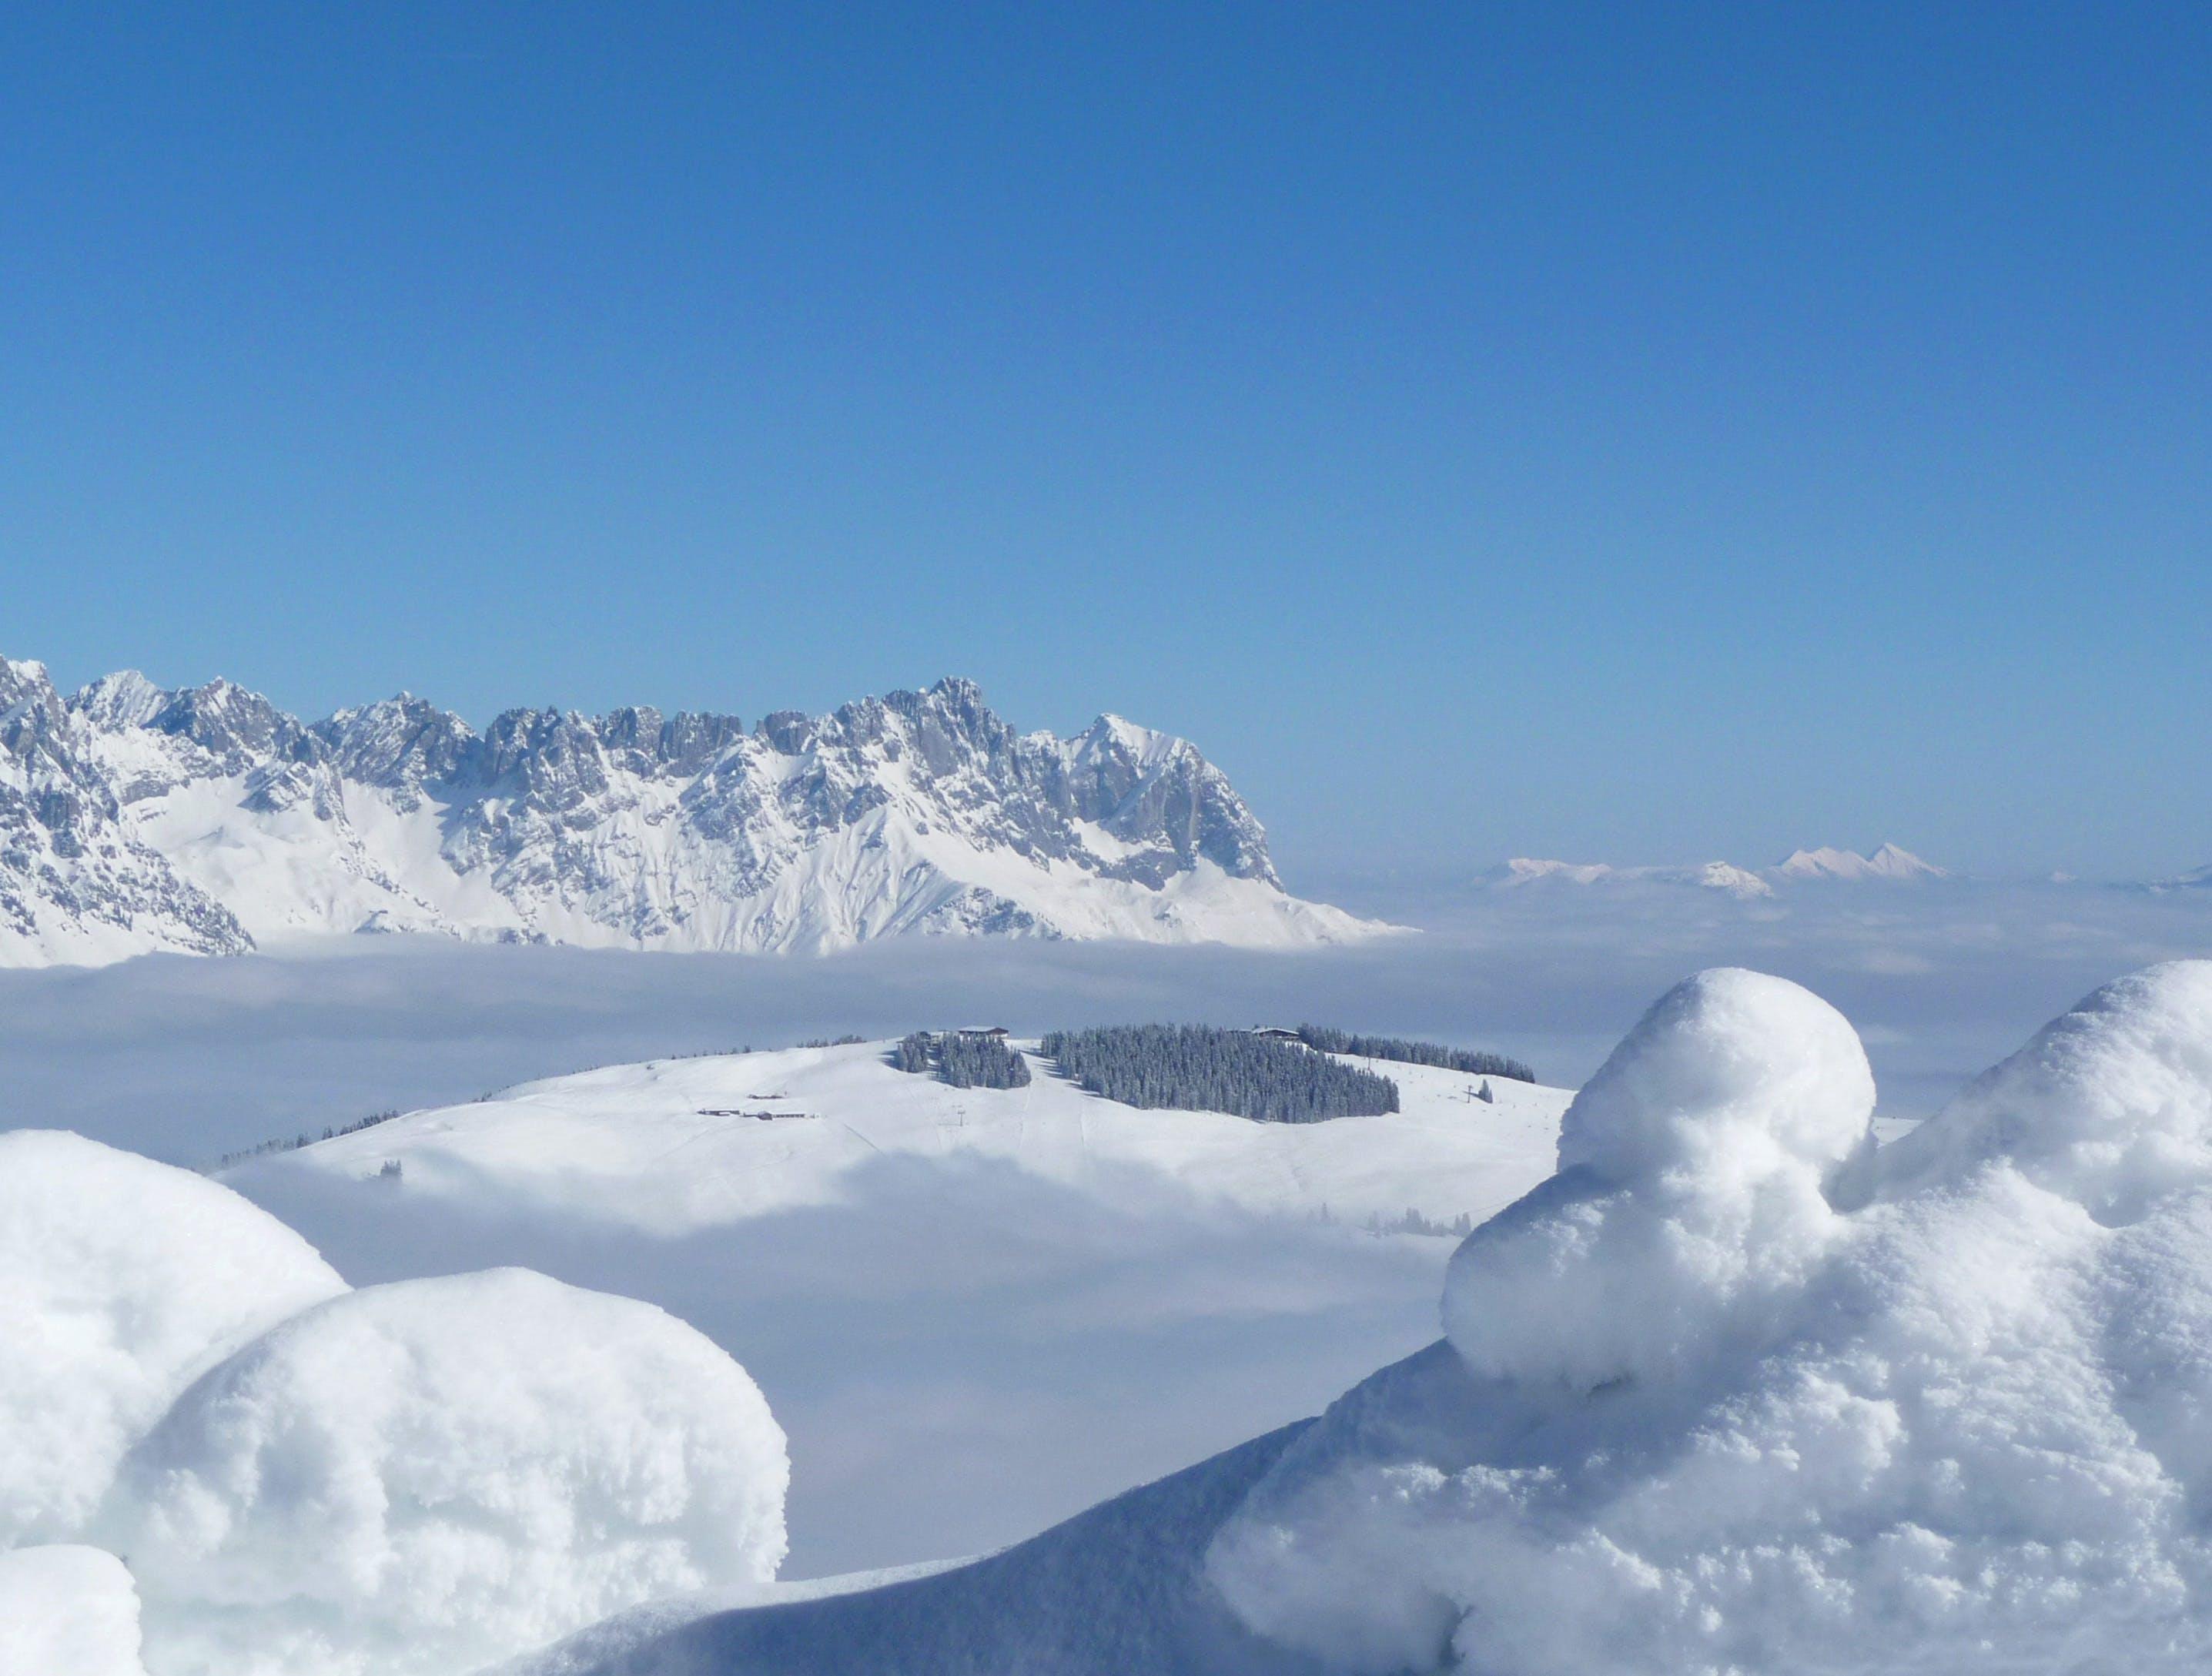 Kostenloses Stock Foto zu abenteuer, alpin, berg, eis